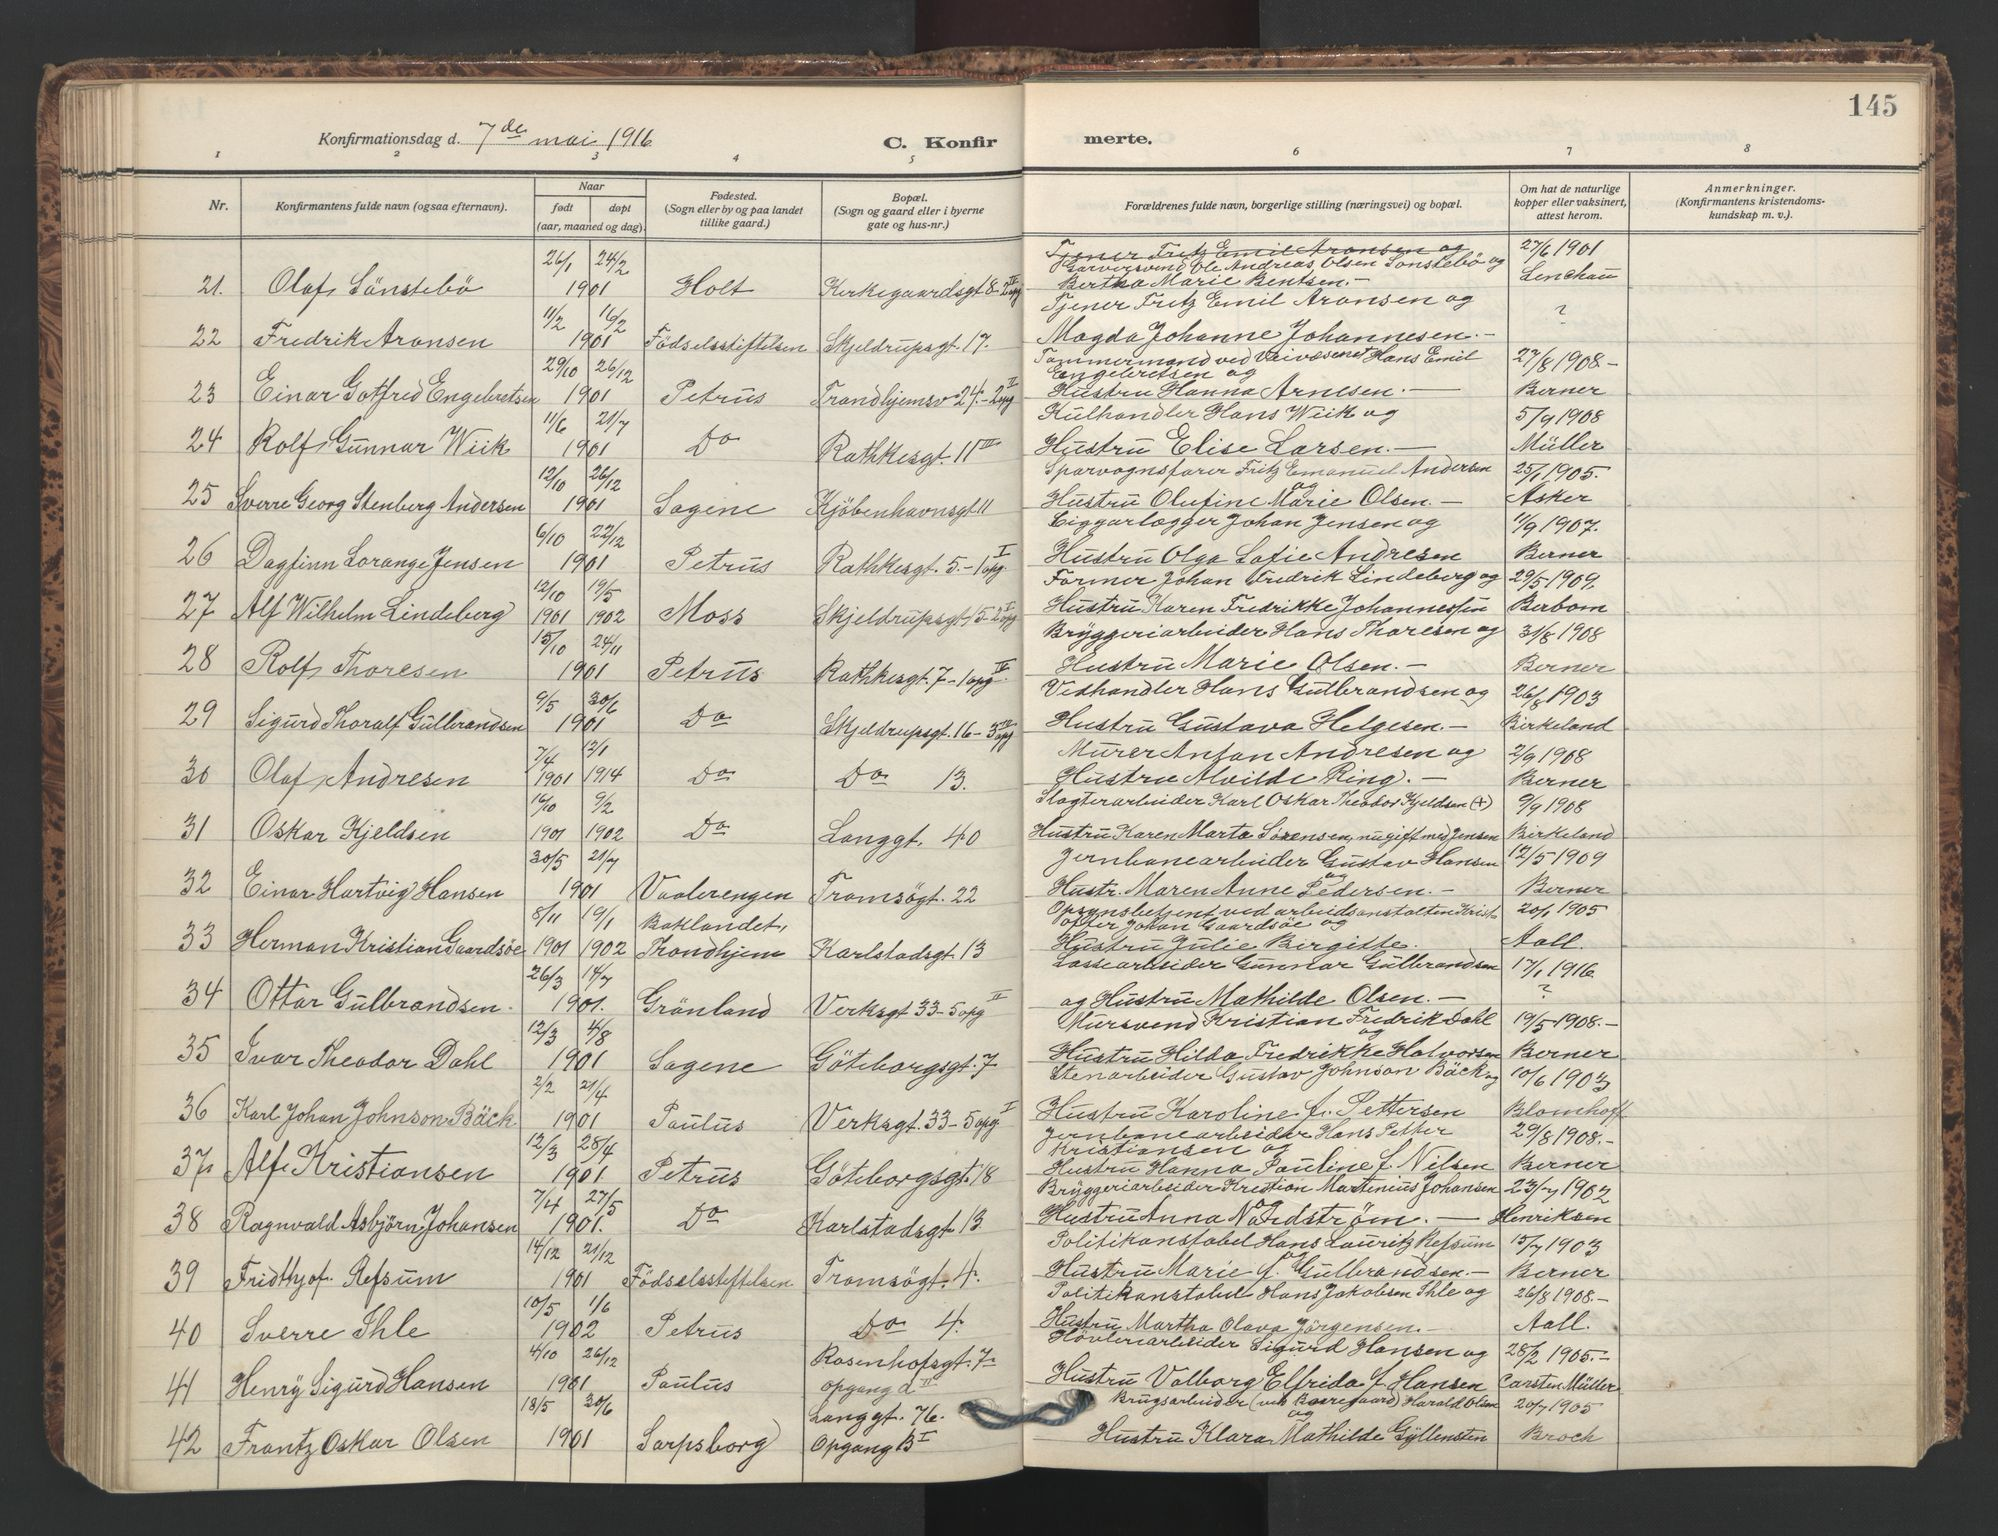 SAO, Petrus prestekontor Kirkebøker, F/Fa/L0011: Parish register (official) no. 11, 1908-1922, p. 145